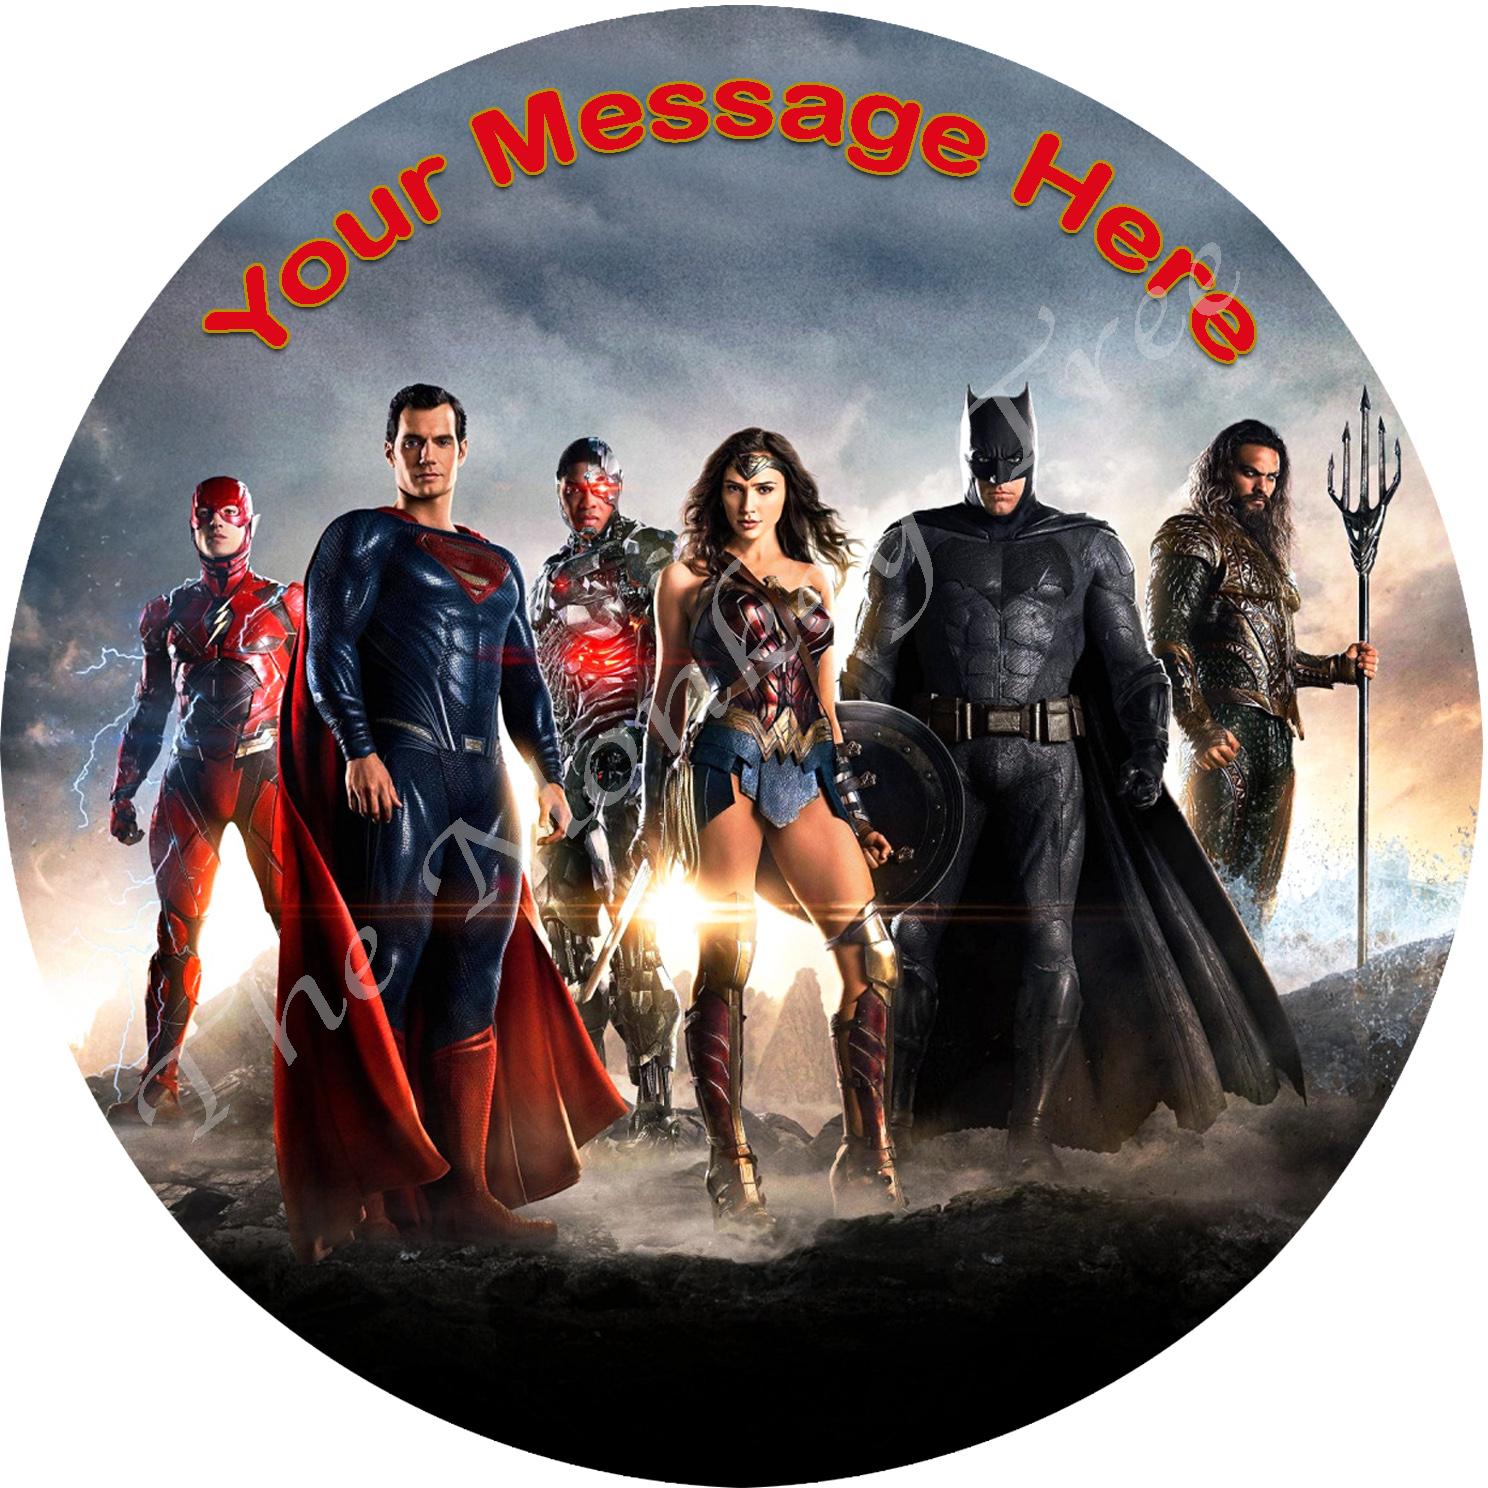 Wonder Woman Justice League Edible Cake Image Topper Birthday Party Fondant Superhero Superman Batman Flash